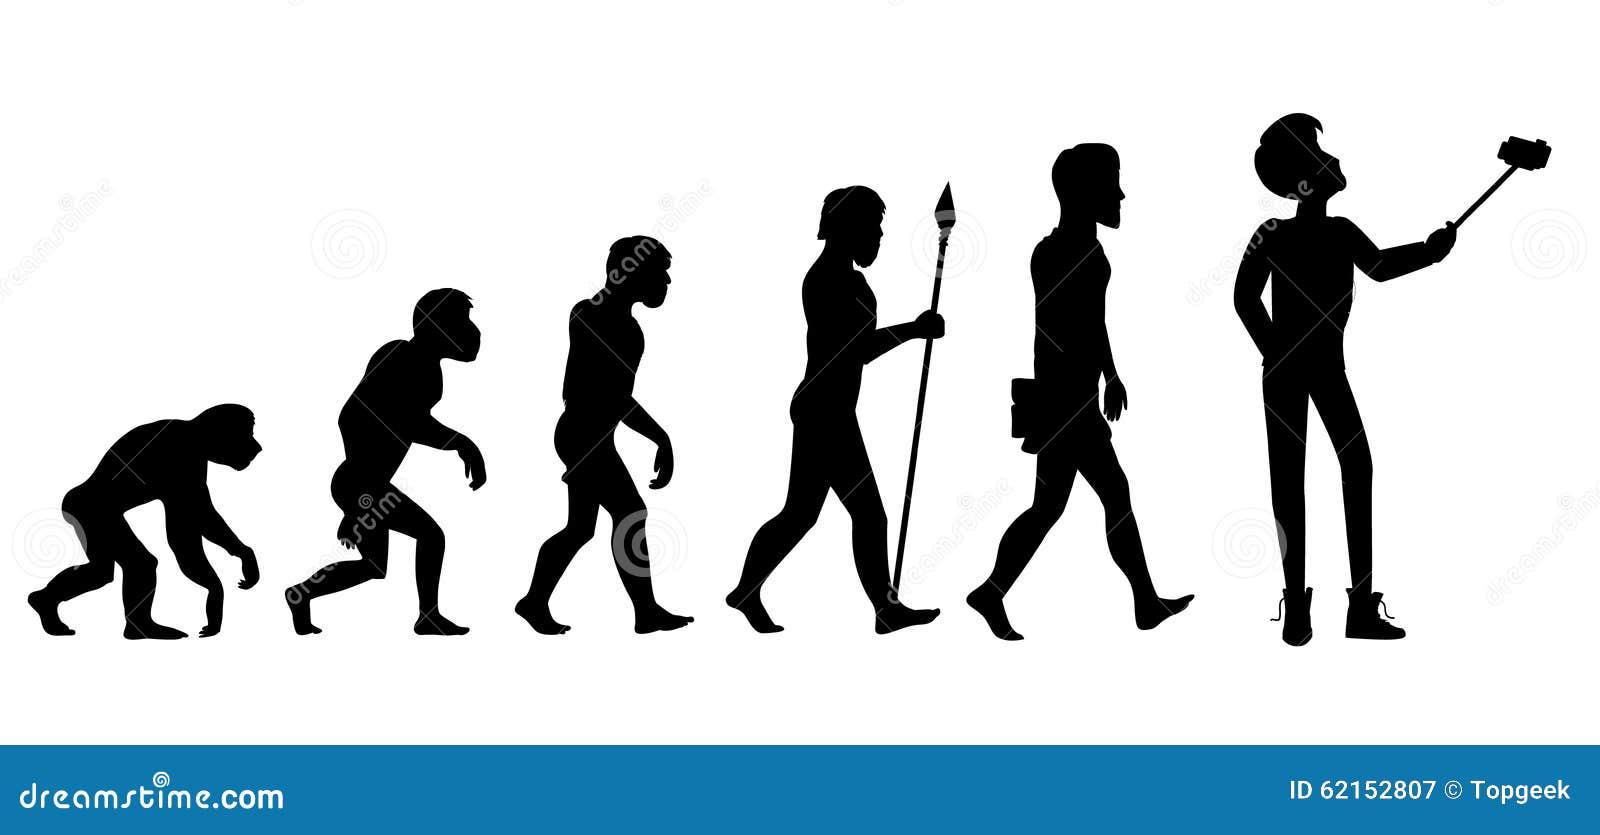 essay on primate evolution anthropology